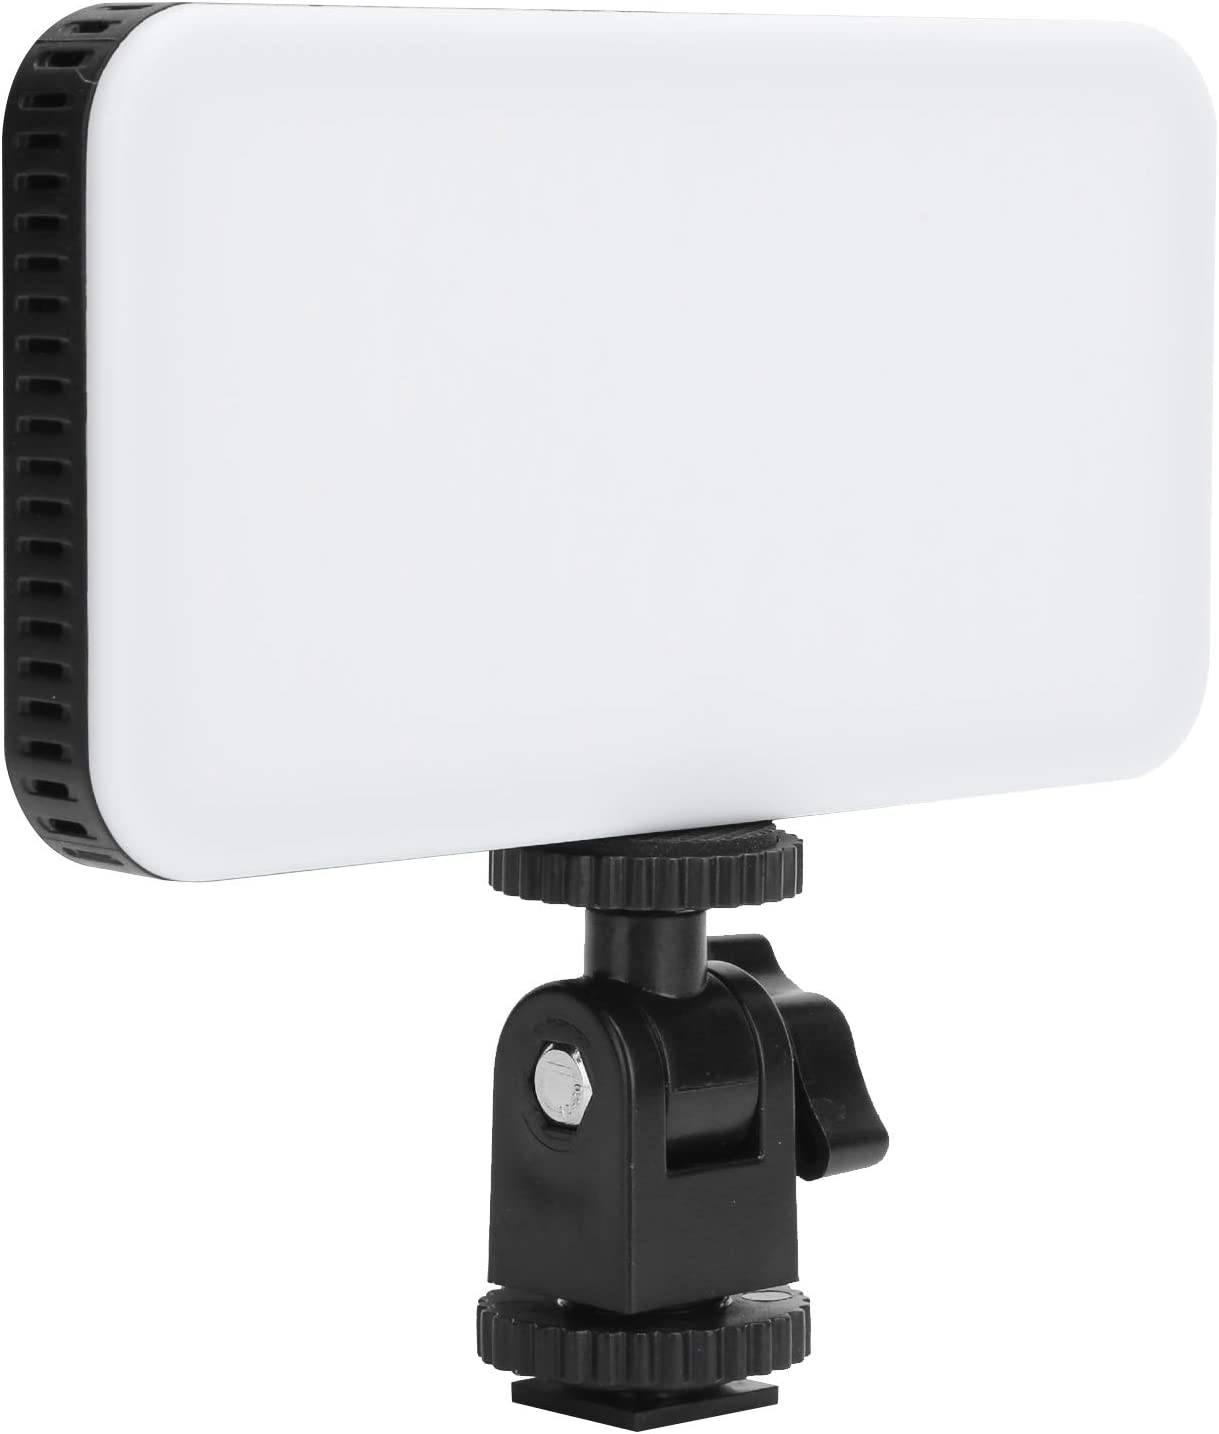 Mini Portable Fill Light Photography Trust Video LED Max 52% OFF Dimmable Li Lamp